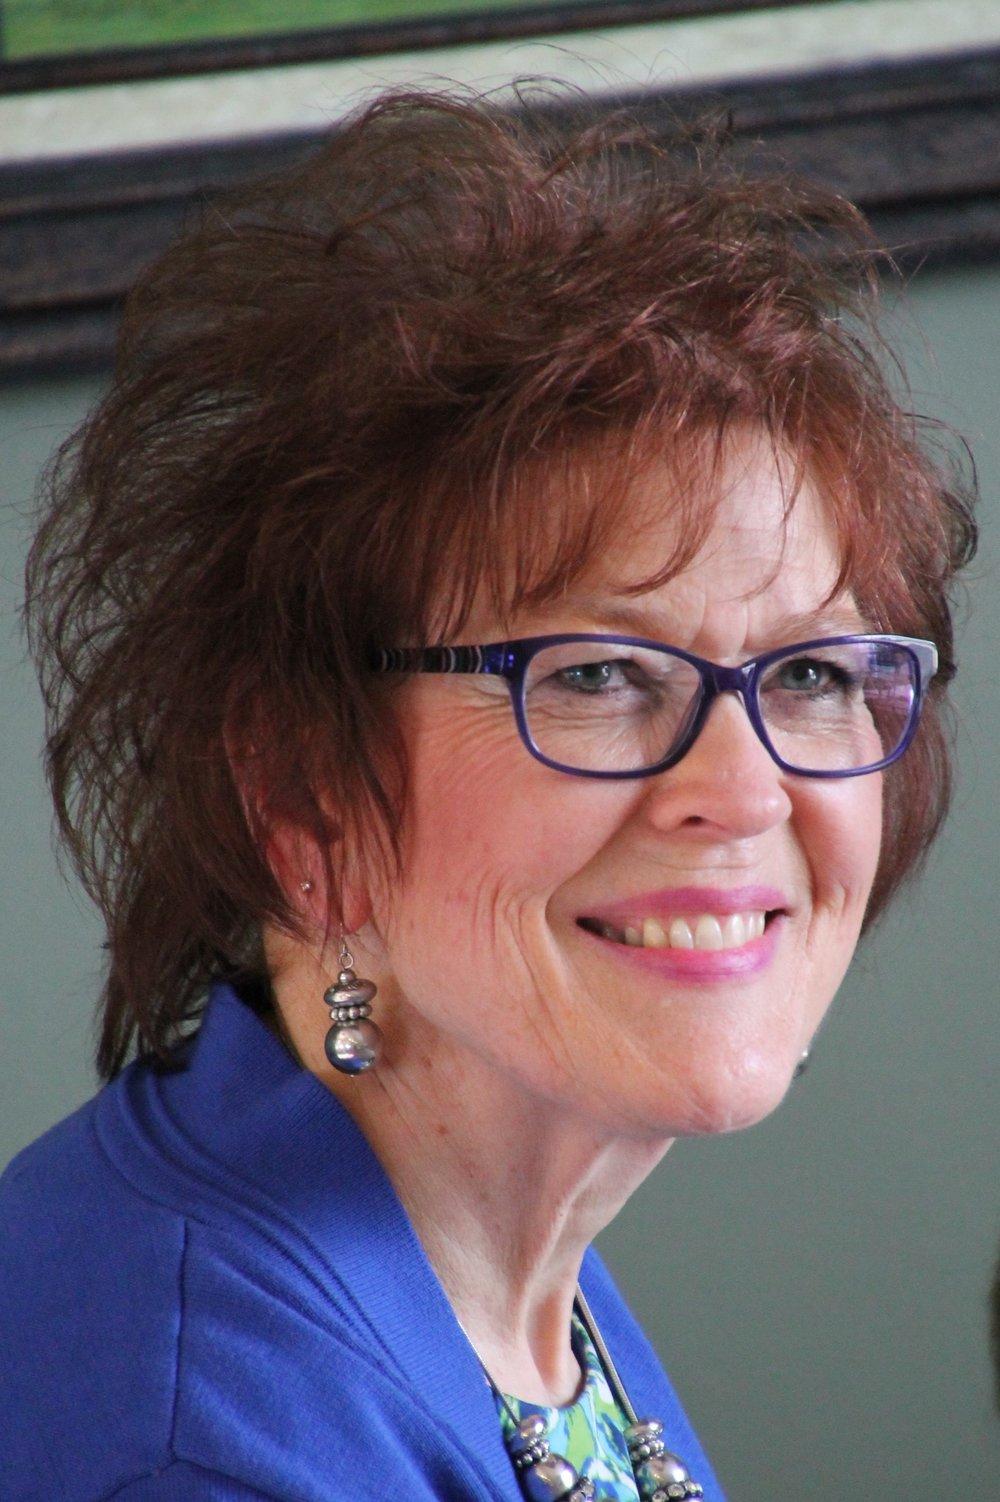 Vicki GilletteCo-Founder, Director, Treasurer -